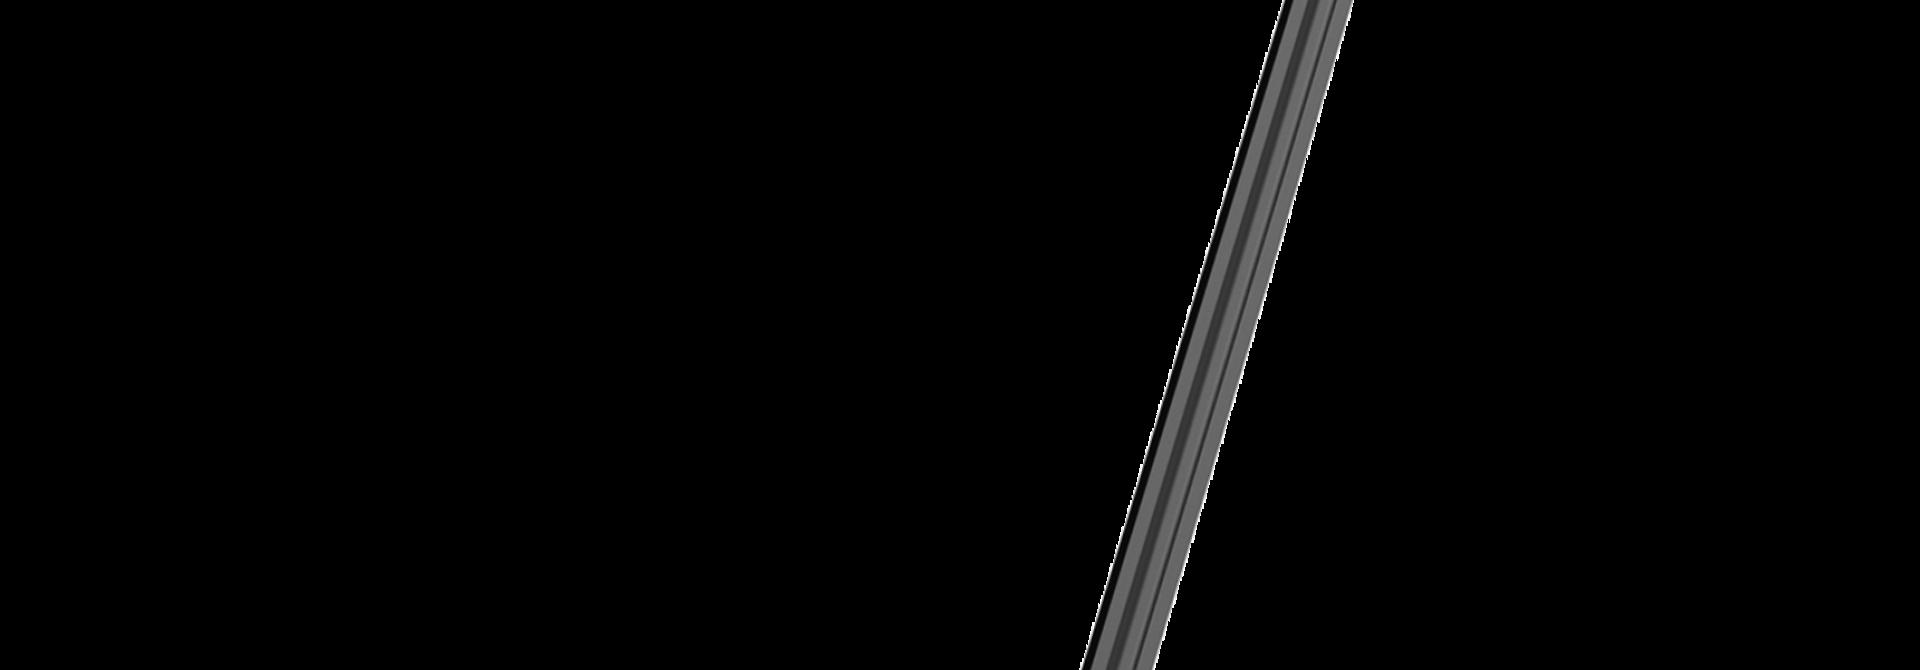 Bolt Ceiling 1Arm Sidefit